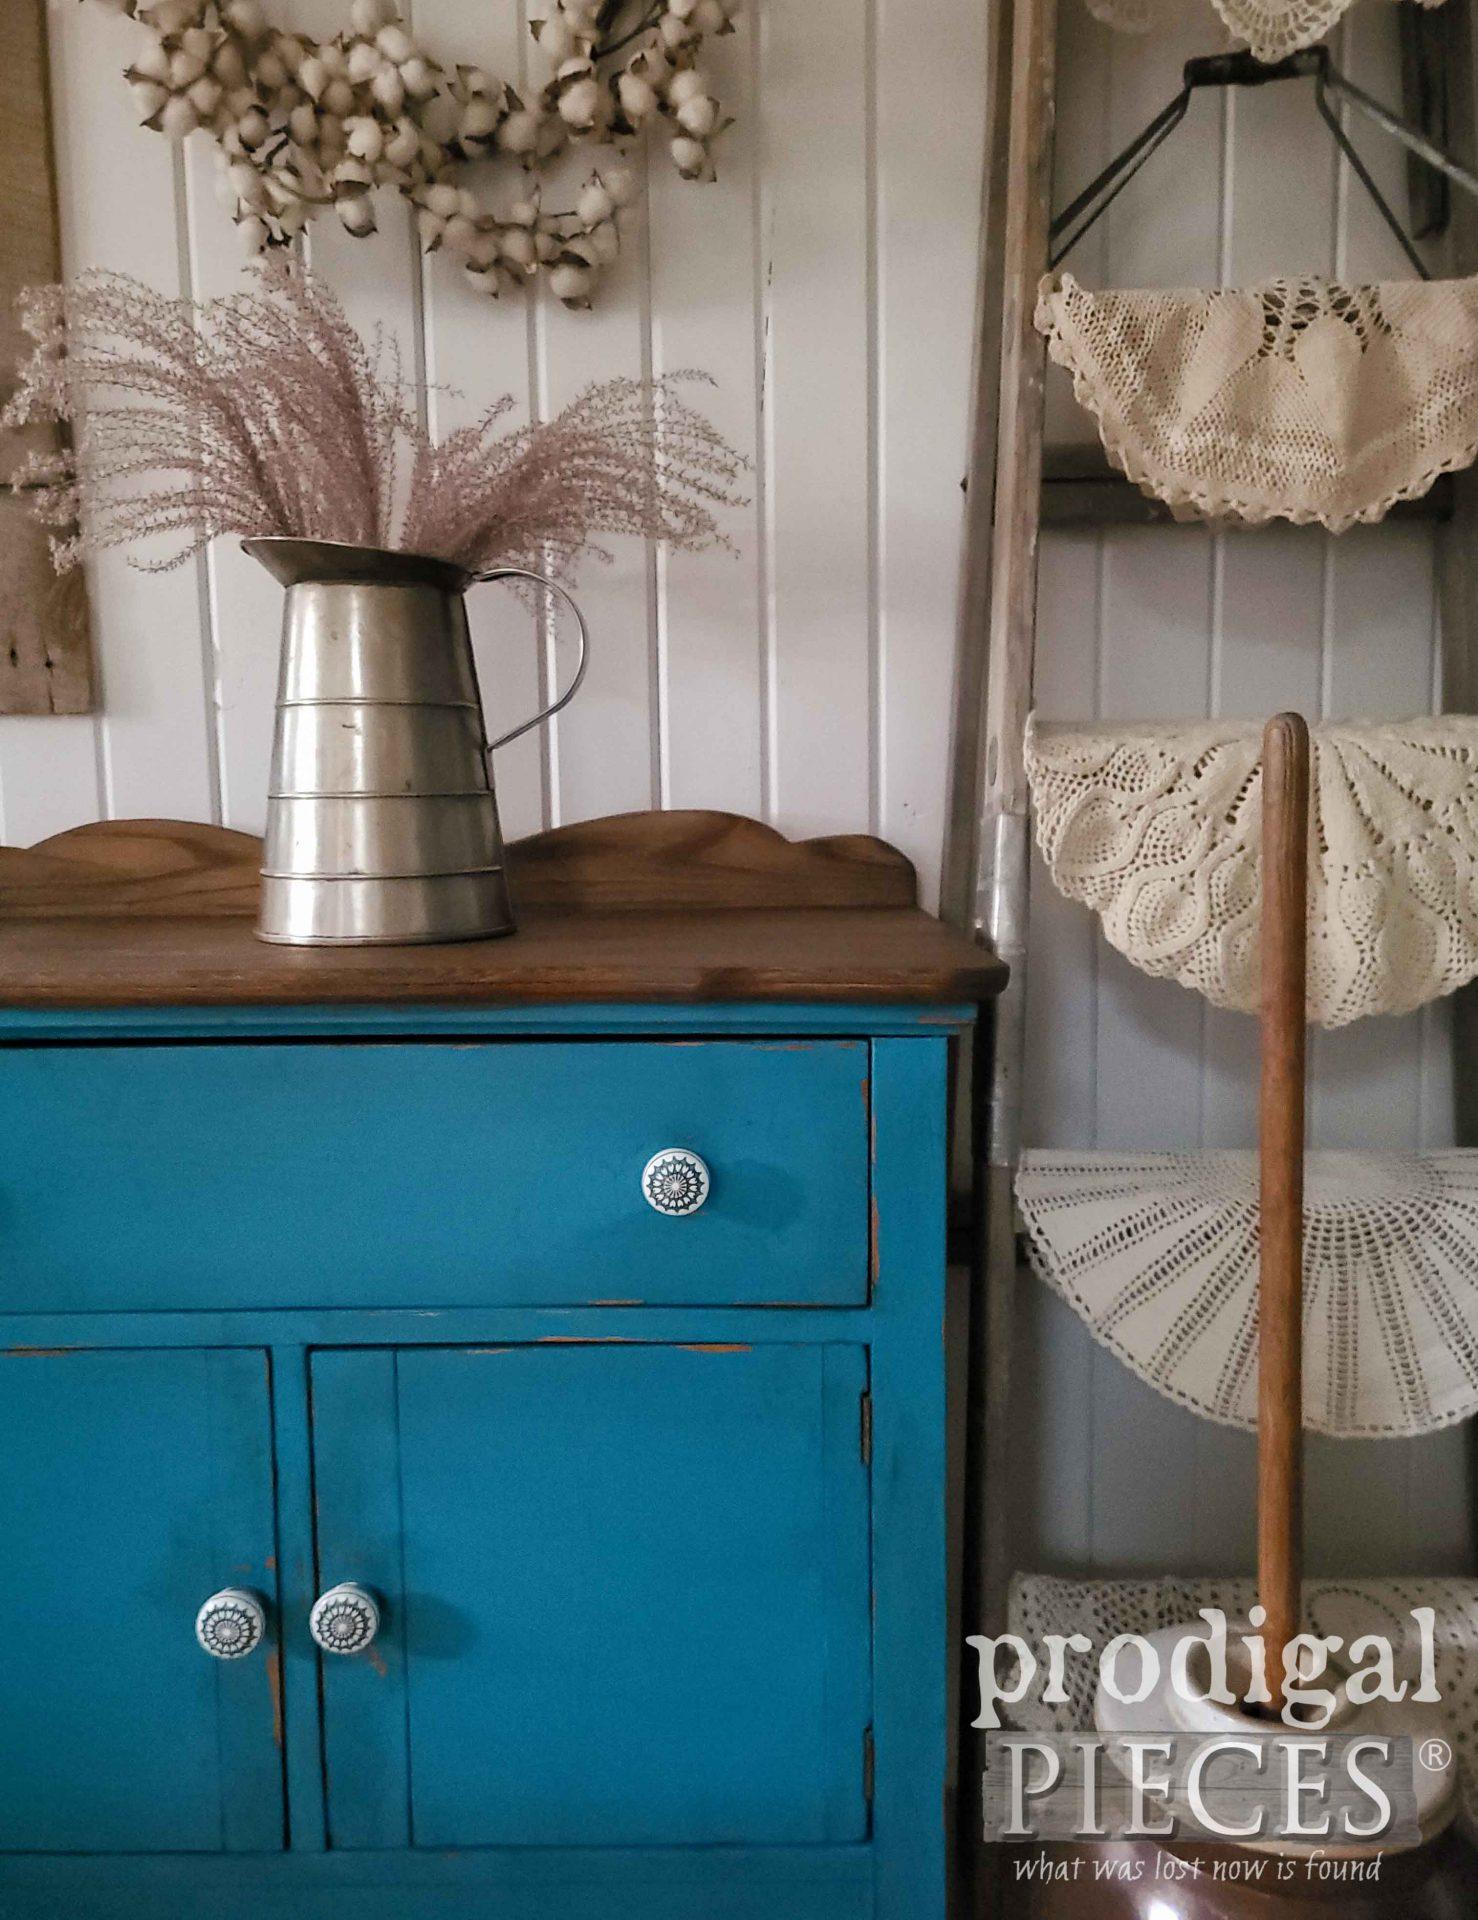 Beautiful Antique Wash Stand Farmhouse Decor by Larissa of Prodigal Pieces   prodigalpieces.com #prodigalpieces #farmhouse #antique #home #diy